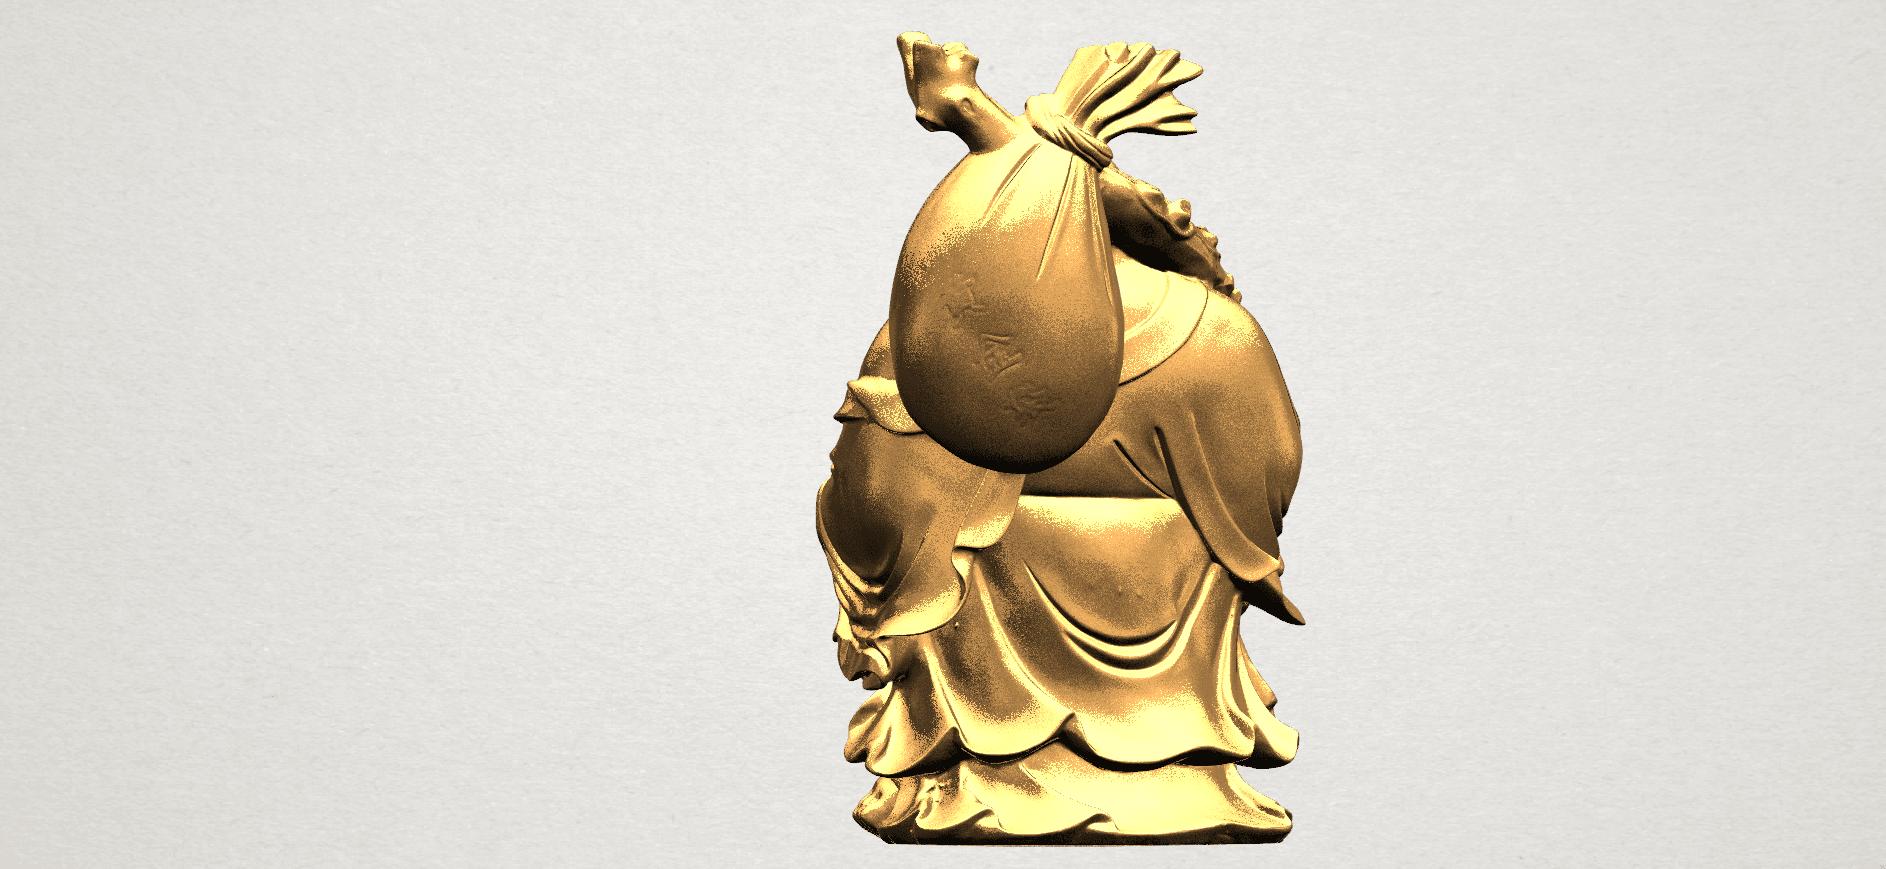 Metteyya Buddha 05 - 88mm - A05.png Télécharger fichier STL gratuit Bouddha Metteyya 05 • Objet imprimable en 3D, GeorgesNikkei